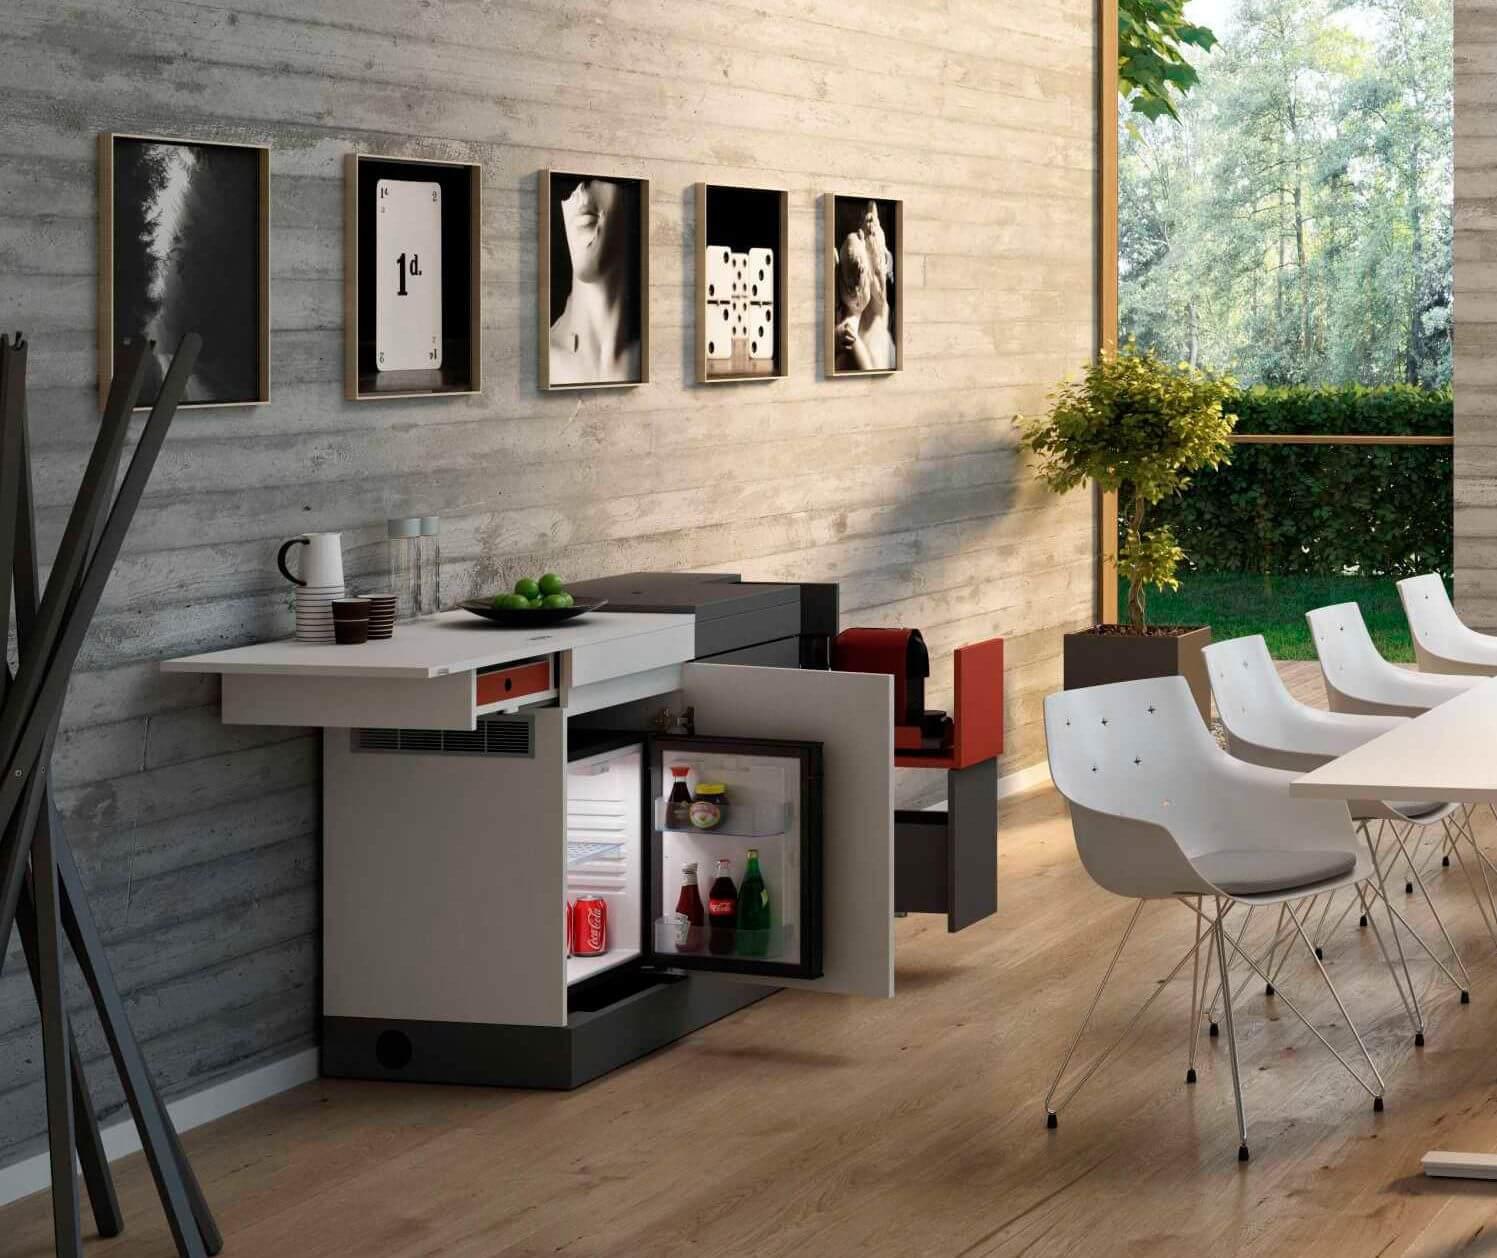 Full Size of Büroküche Comic Büro Küche Obi Büroküche Büro Küche Lidl Küche Büroküche